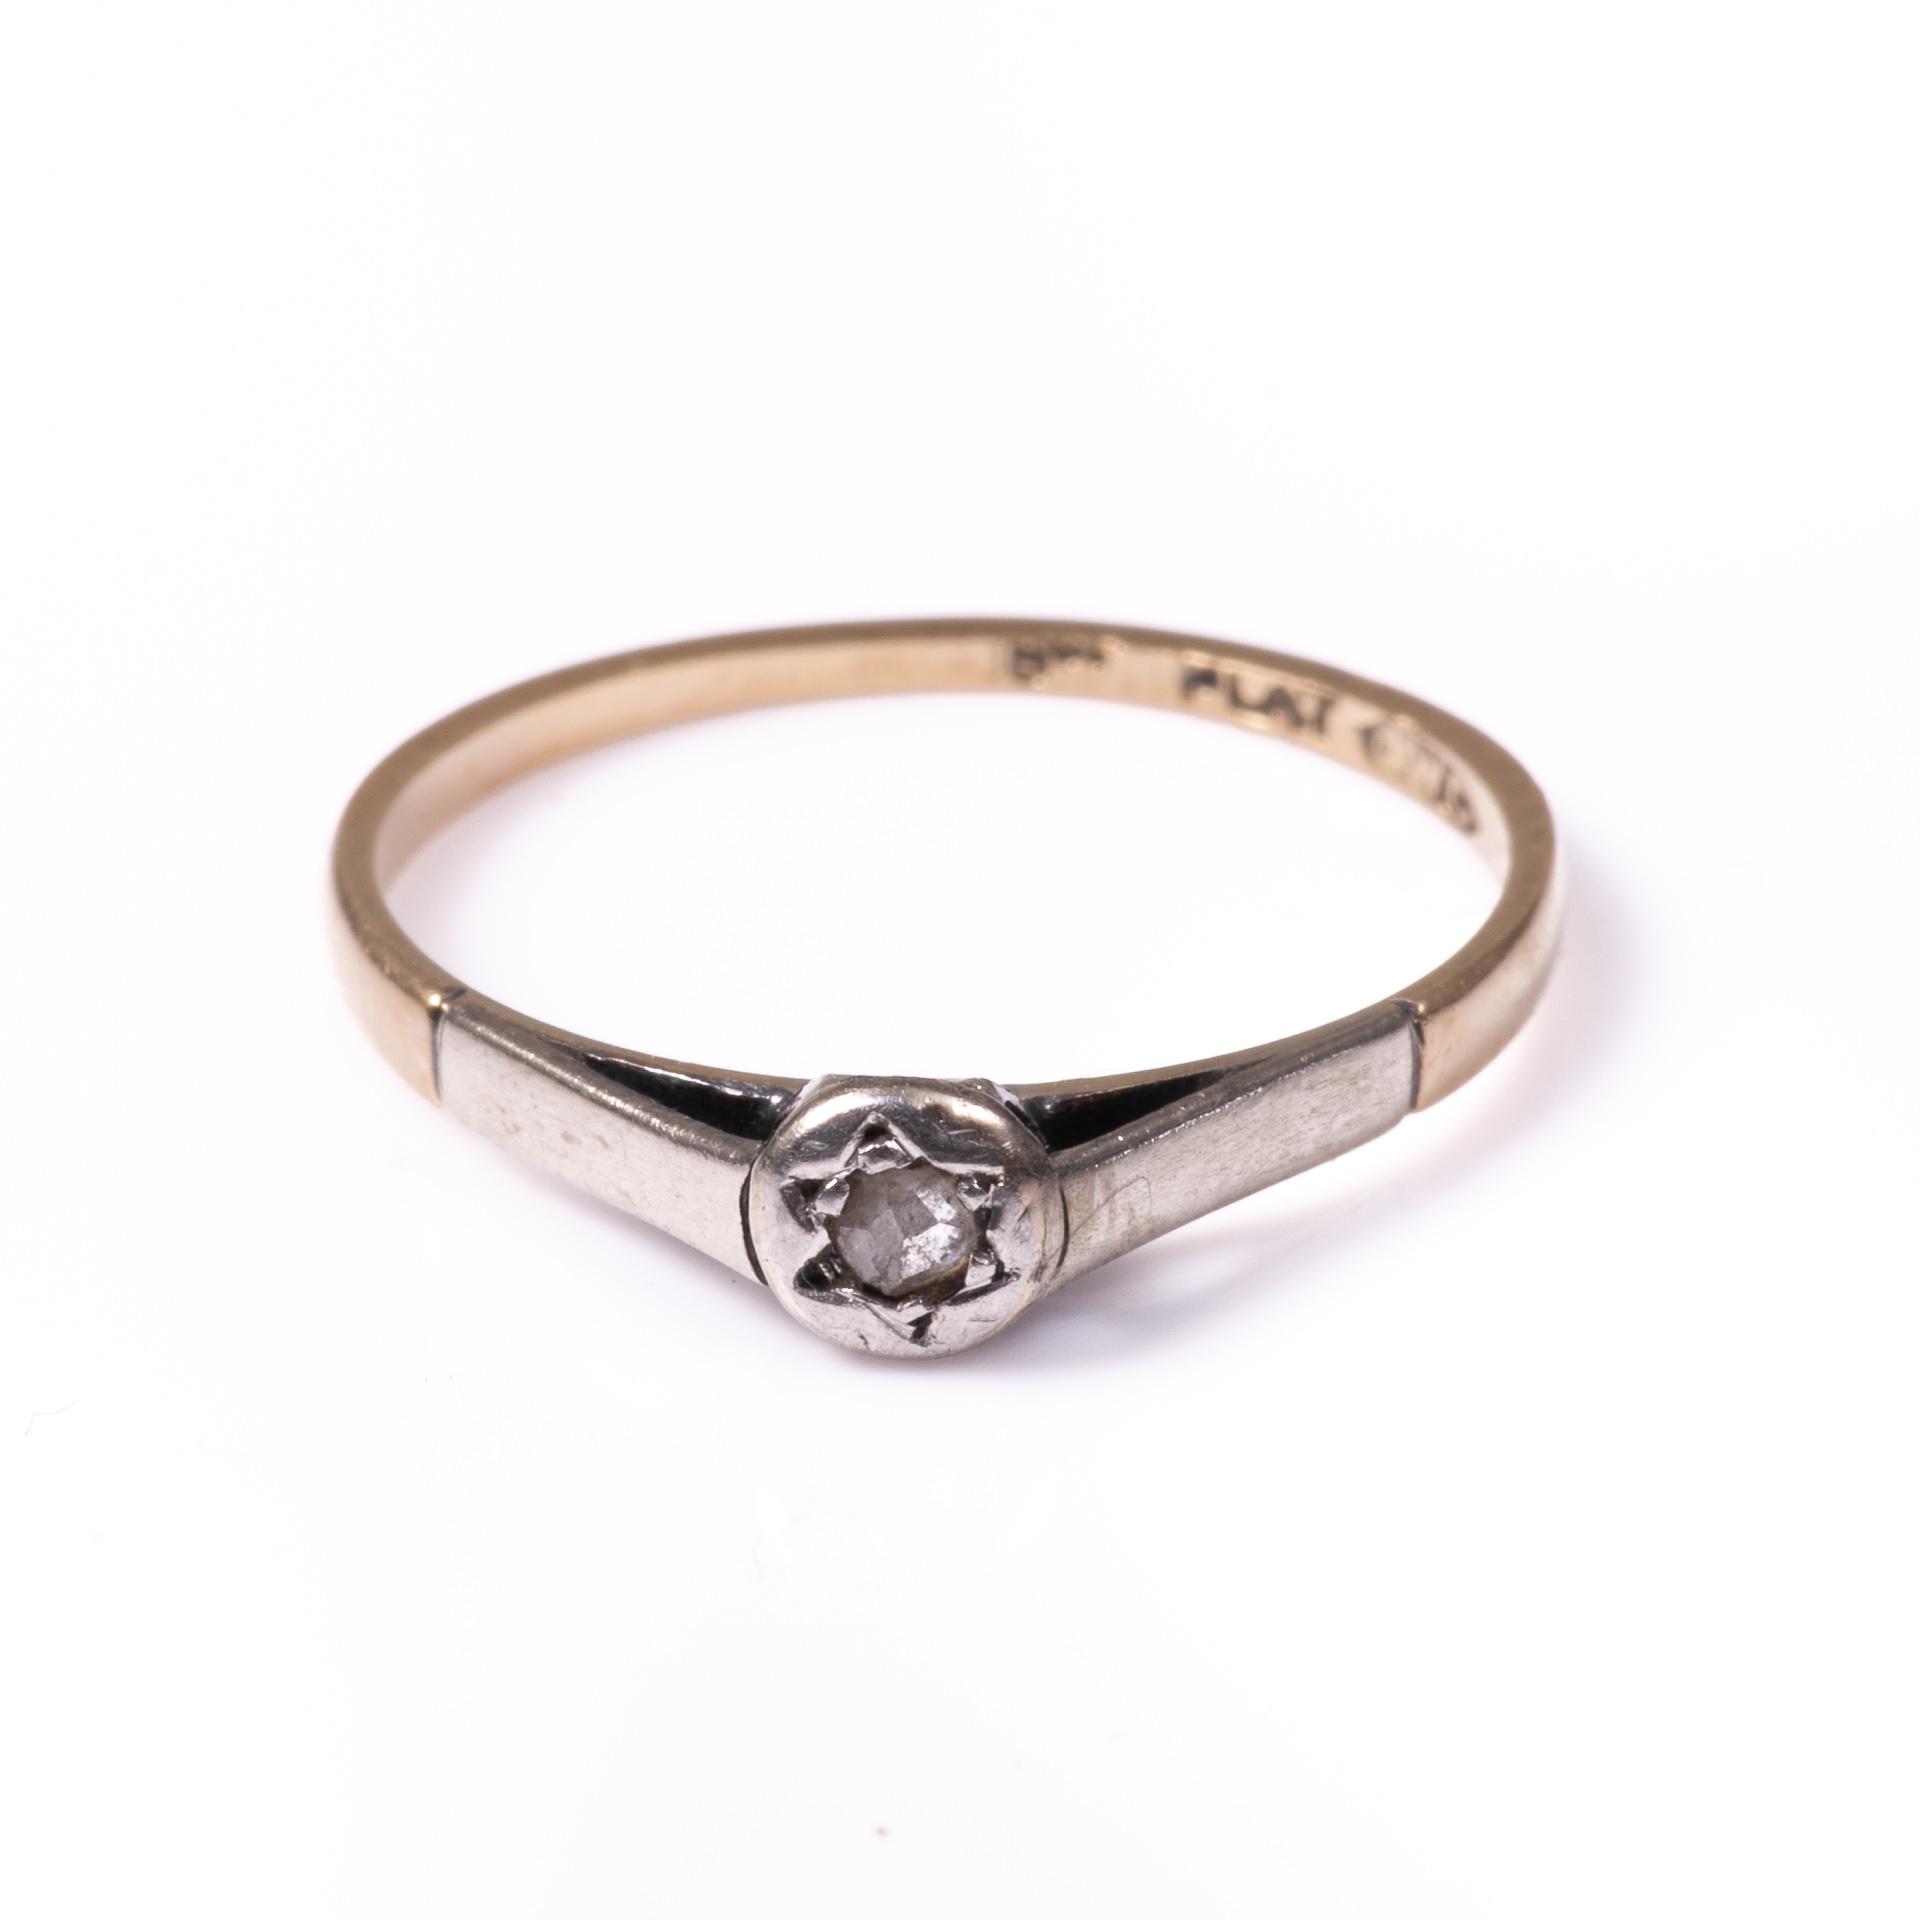 18ct Gold & Platinum Rose Cut Diamond Ring - Image 3 of 7